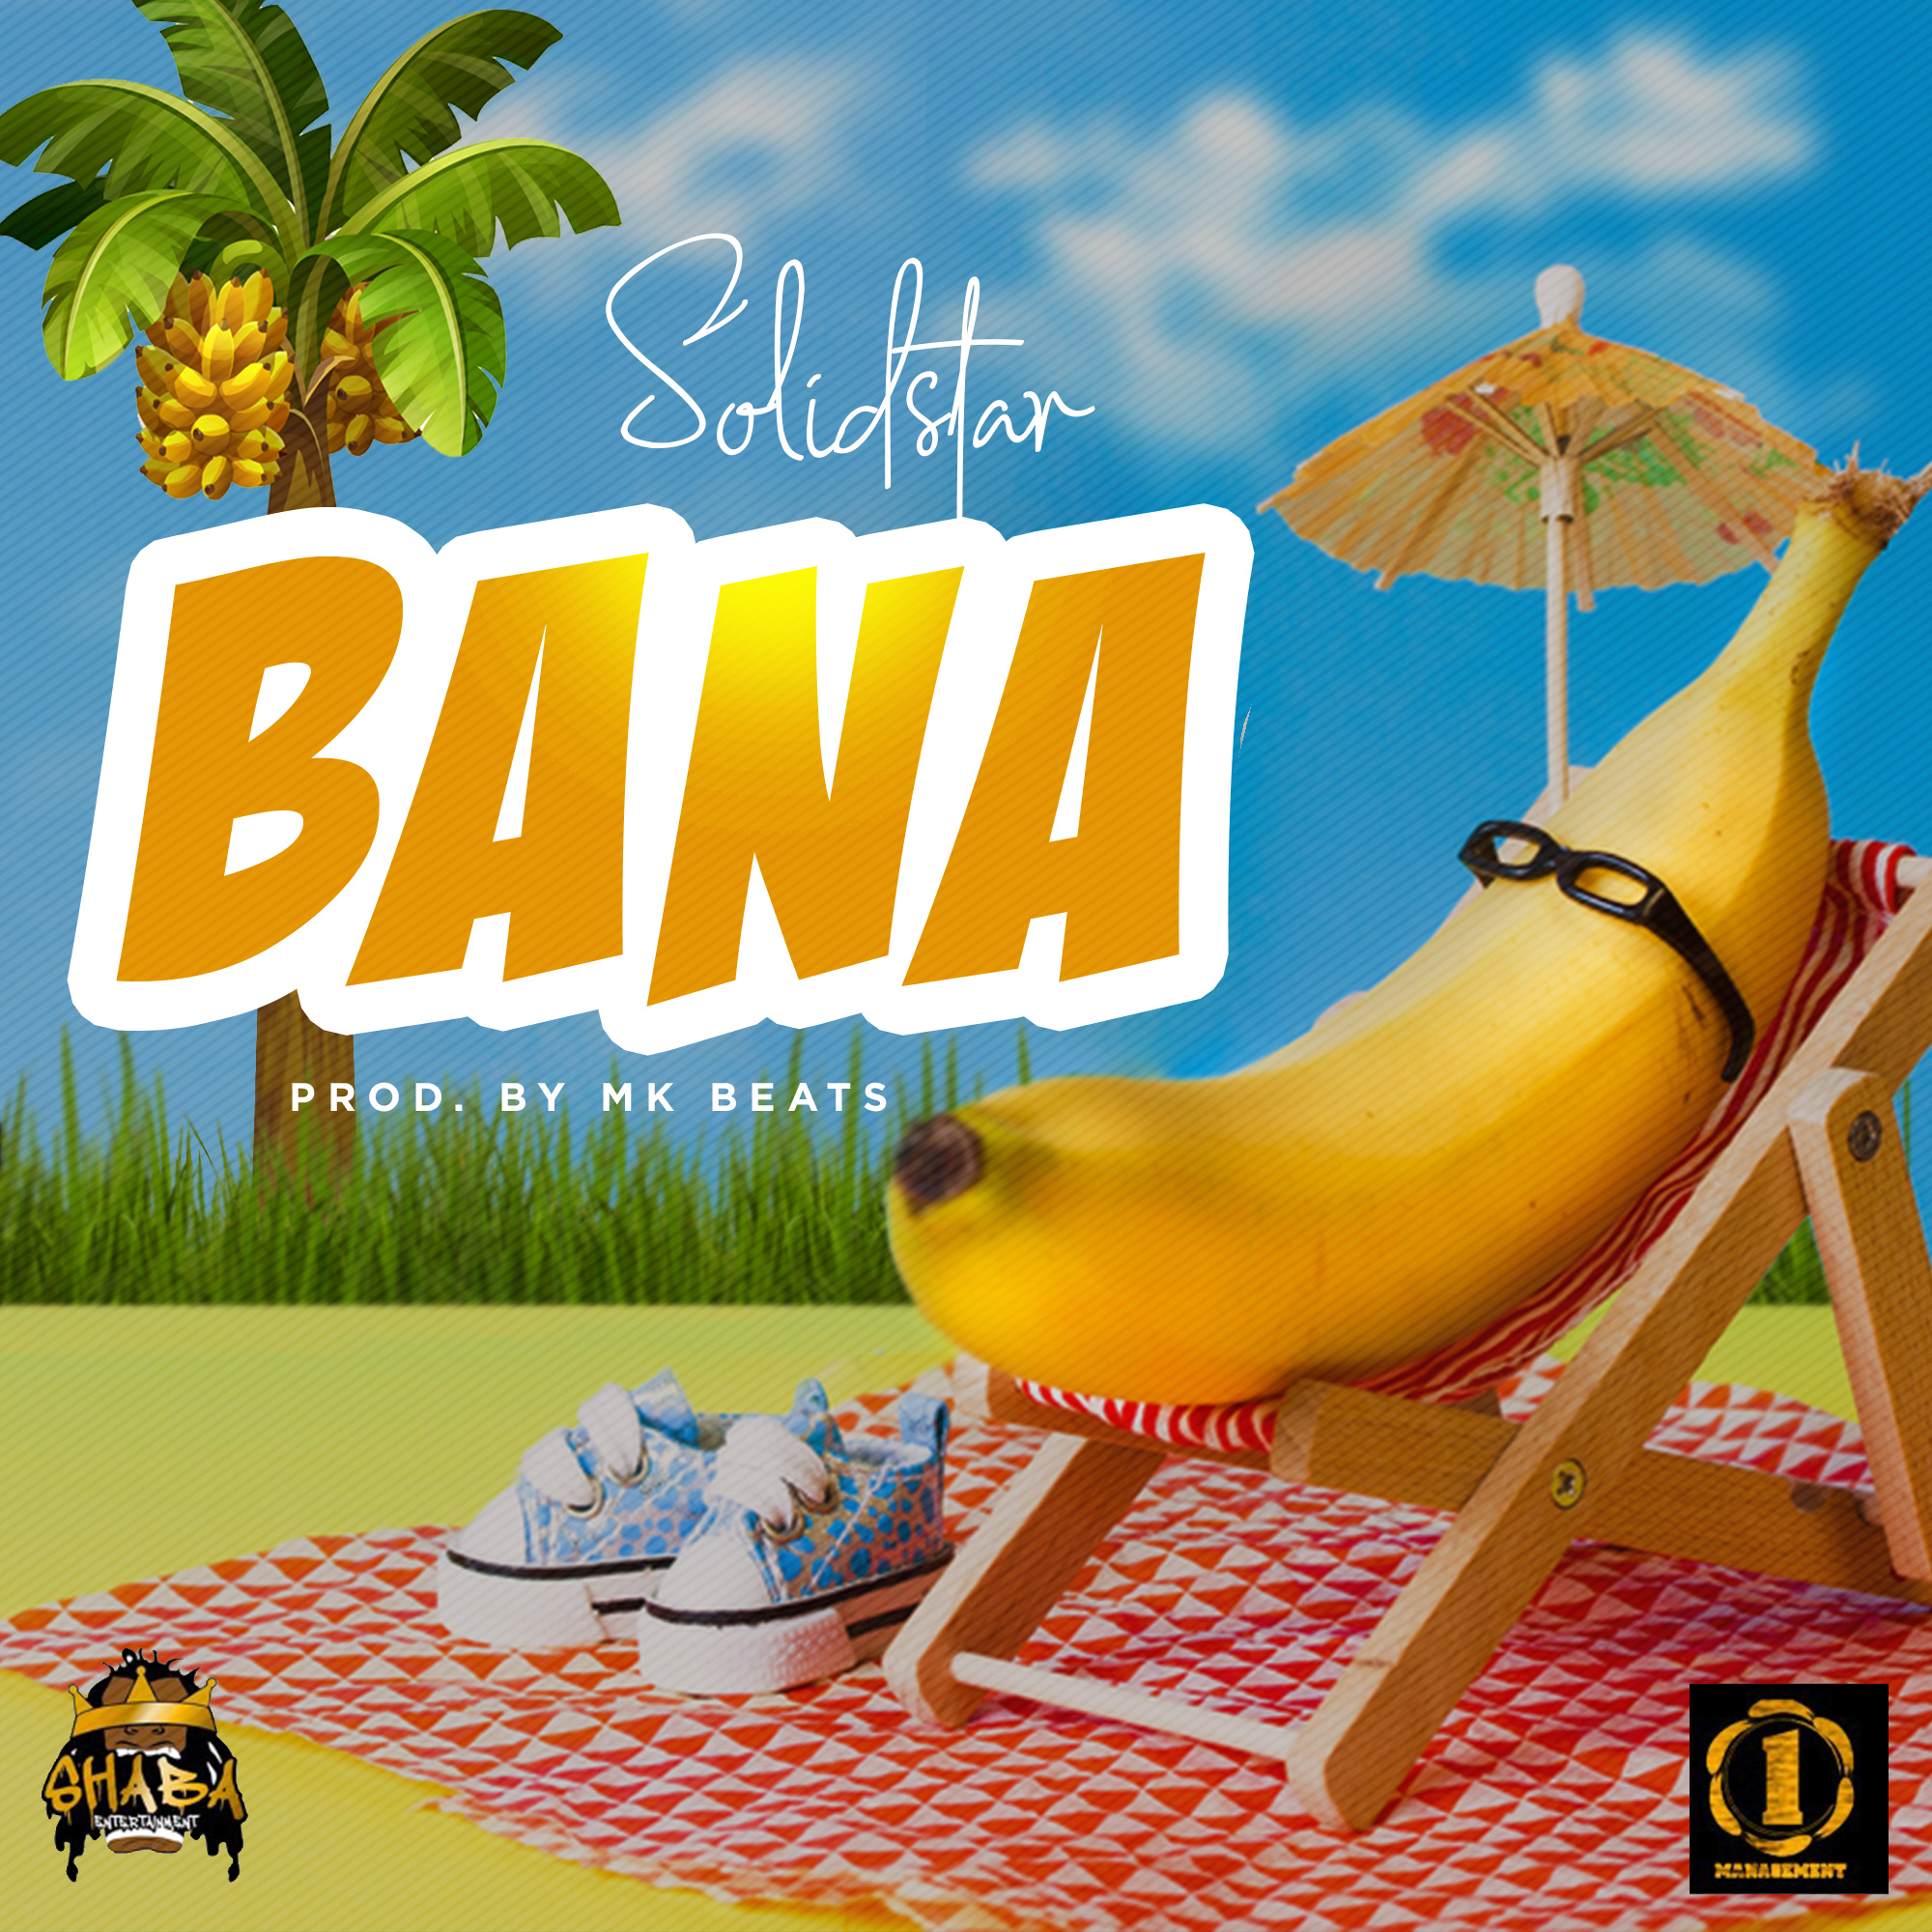 Solidstar - Bana (Prod. By MK Beats)